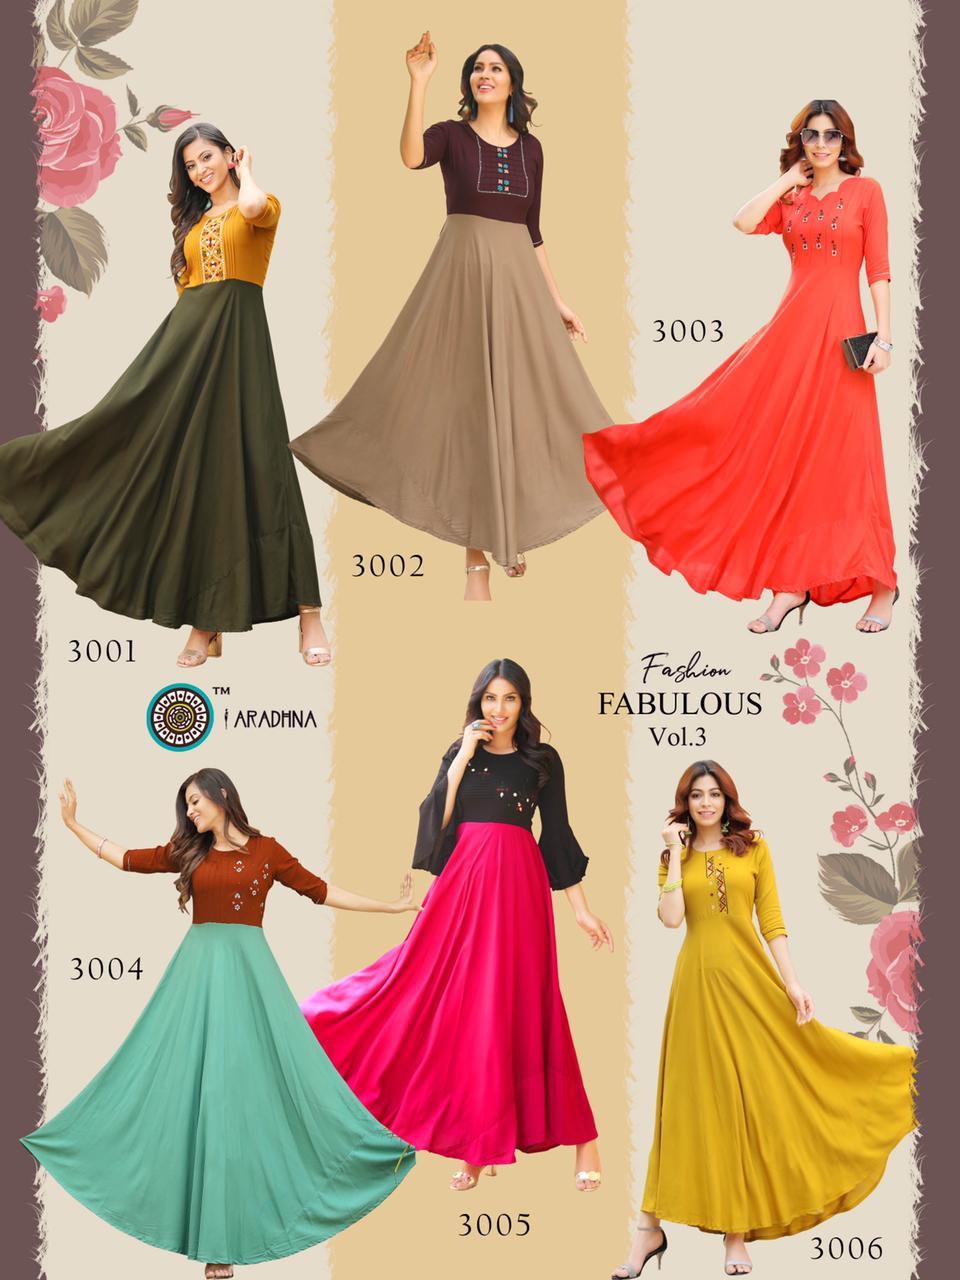 Aradhna Fashion Fabulous Vol 3 Kurti Wholesale Catalog 12 Pcs 20 - Aradhna Fashion Fabulous Vol 3 Kurti Wholesale Catalog 12 Pcs